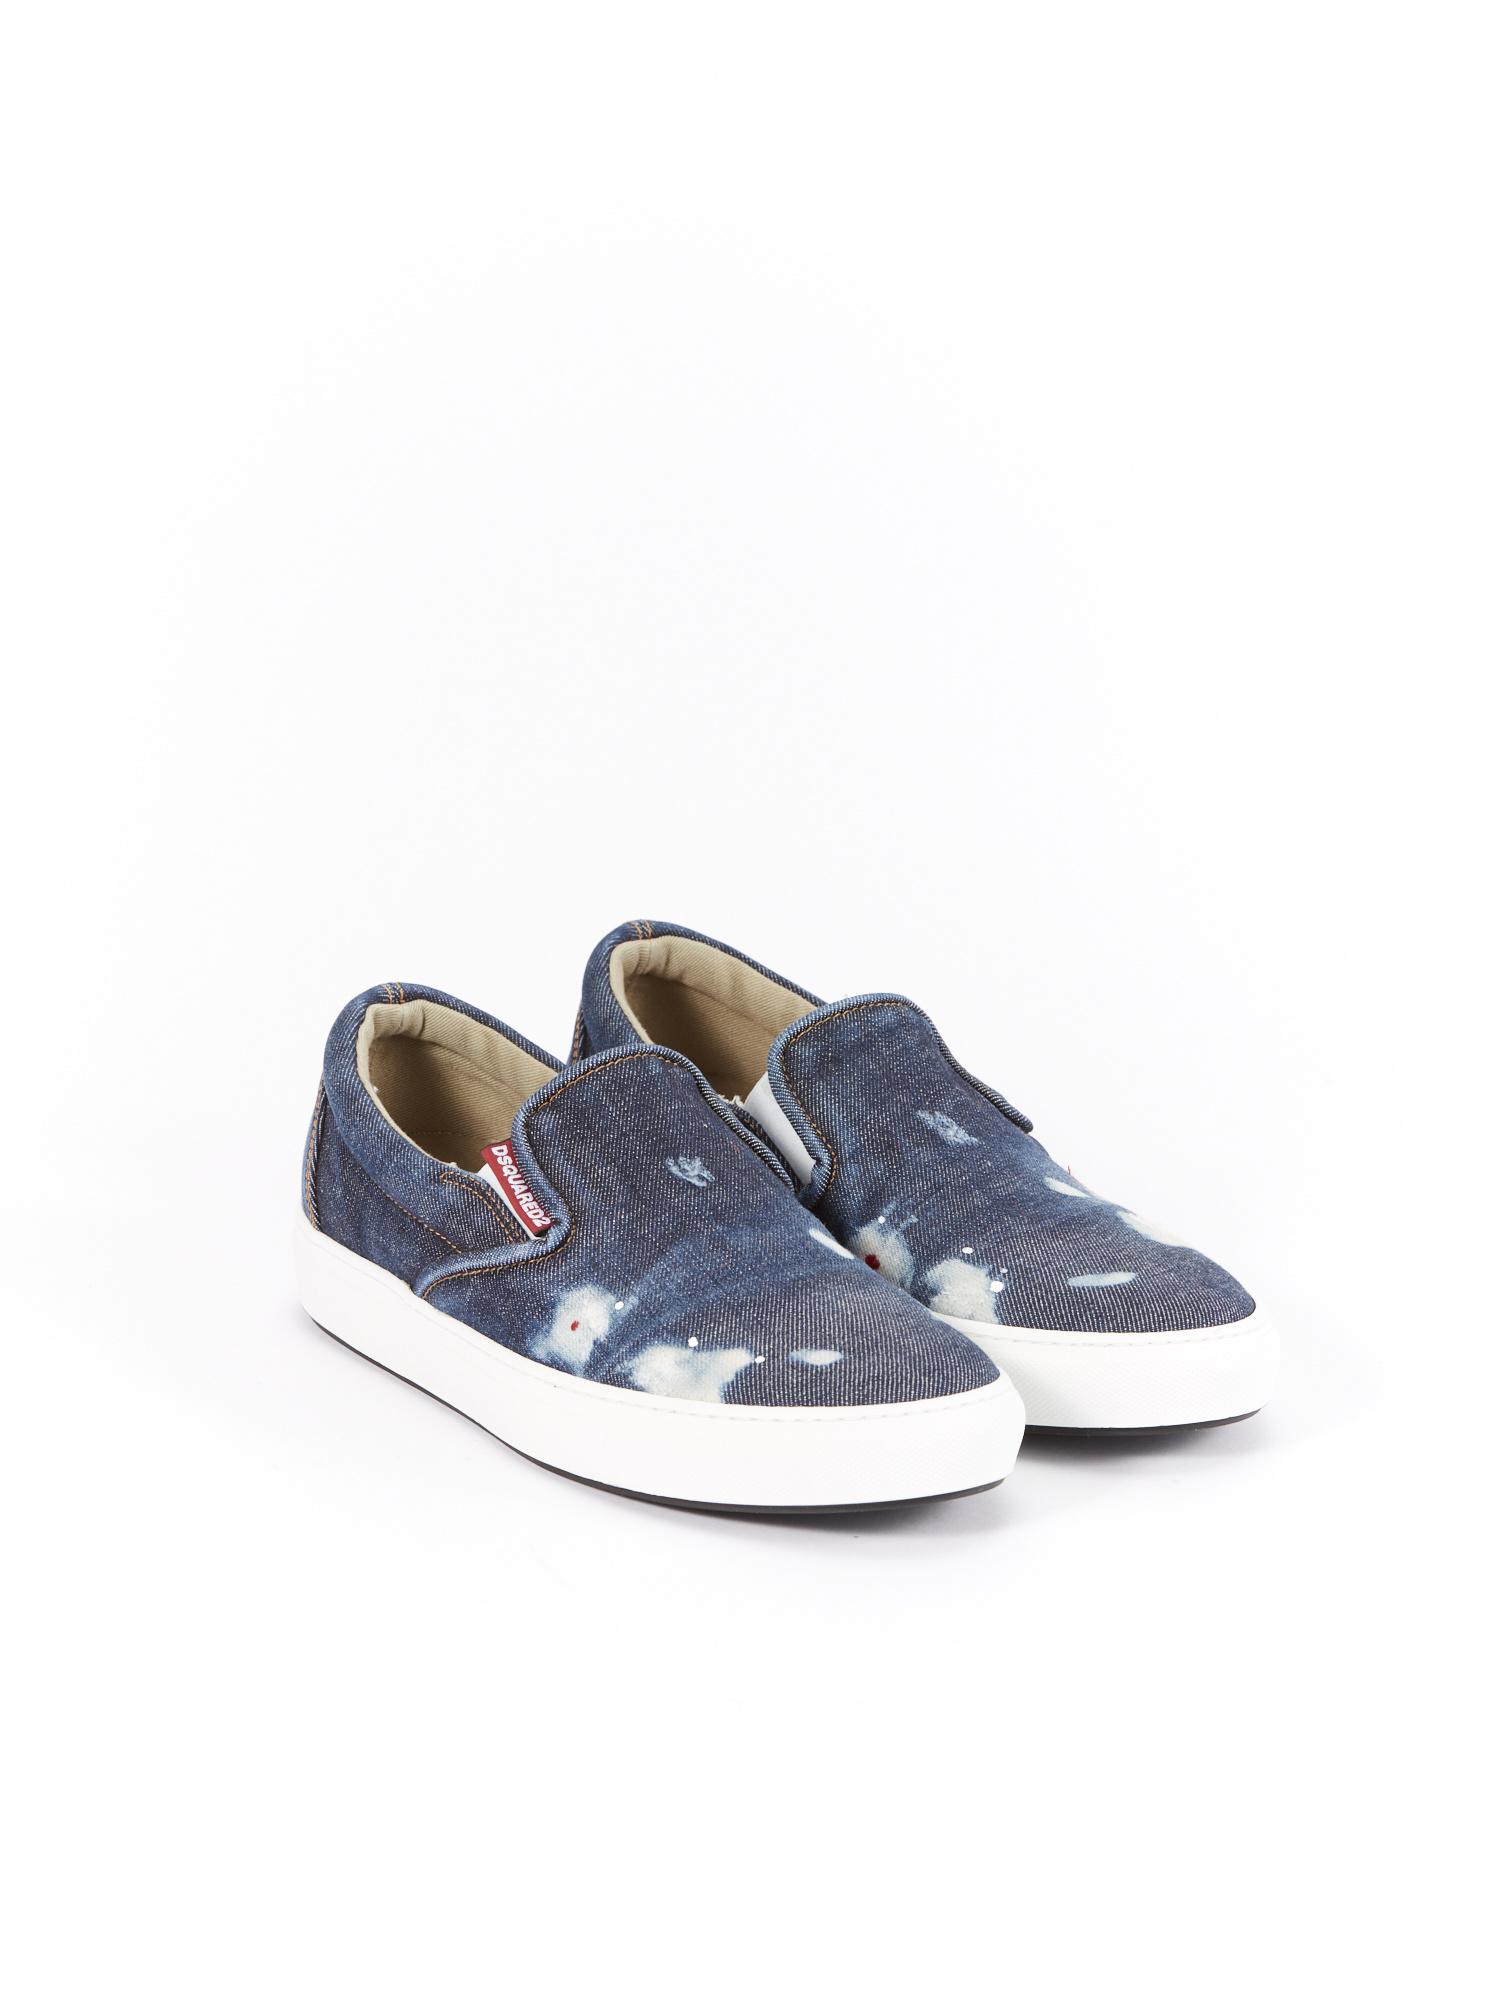 DSQUARED2 Denim Slip-On Sneakers   RUSE